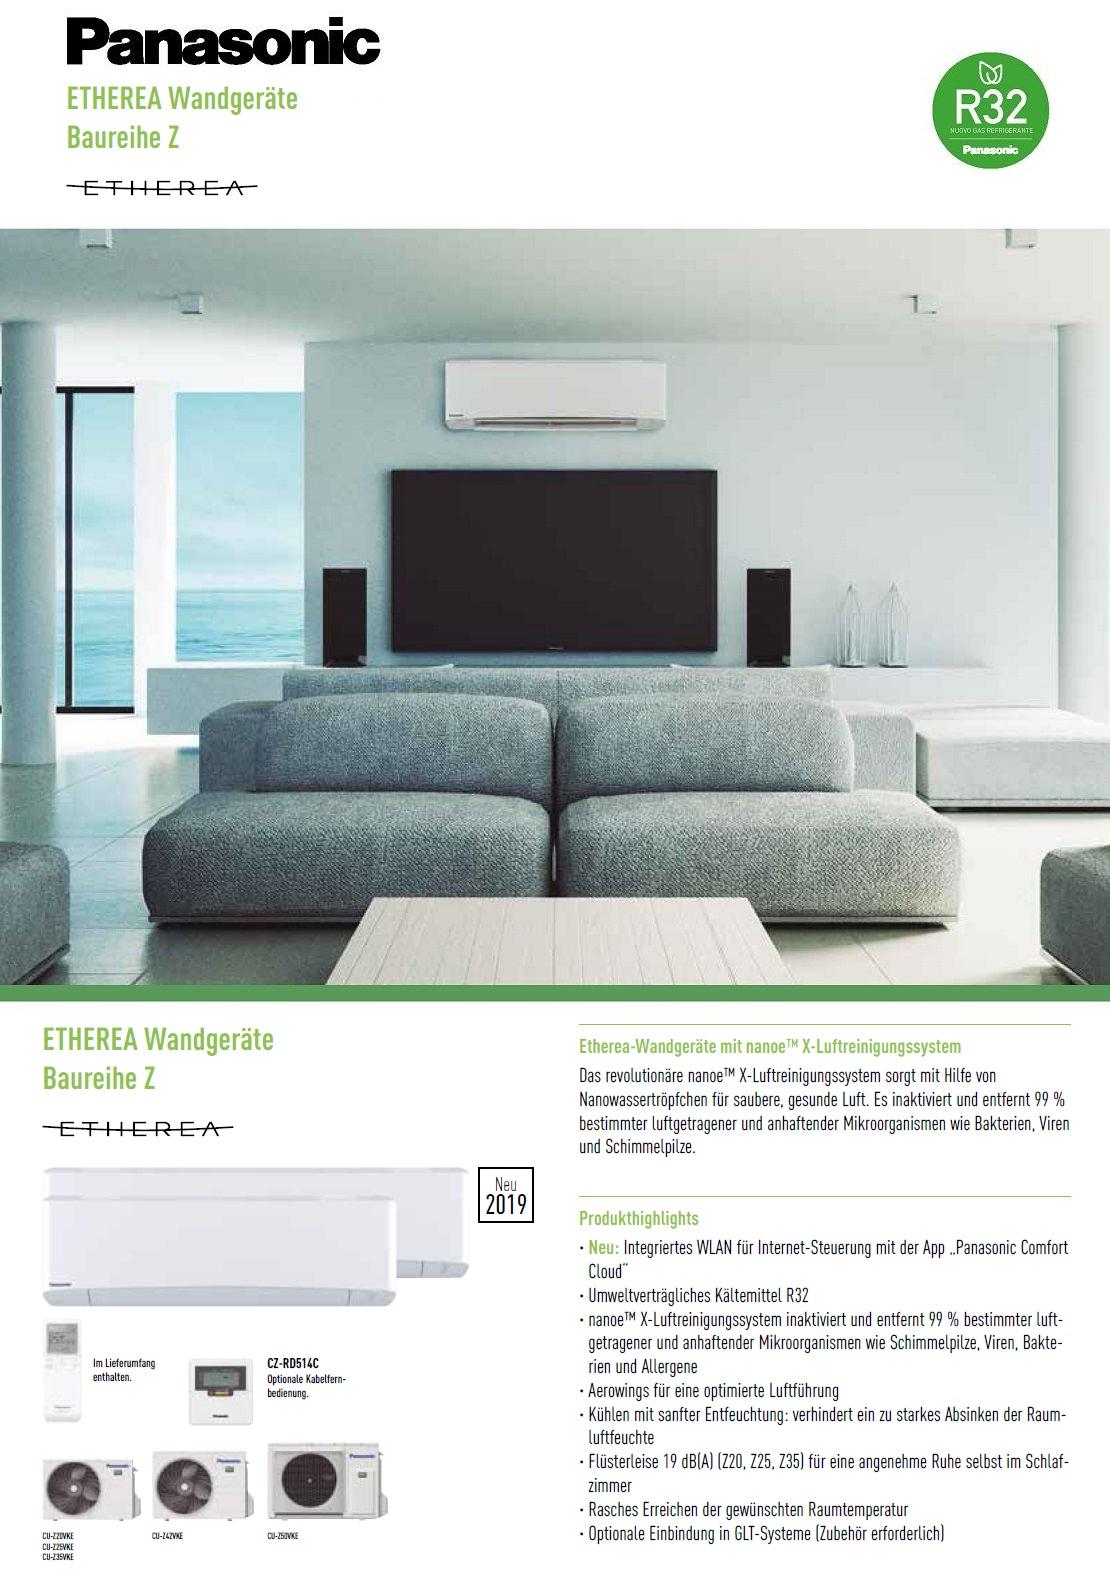 Klimaanlagen Panasonic Mono Split 15000 Btu Z Etherea A++/A+